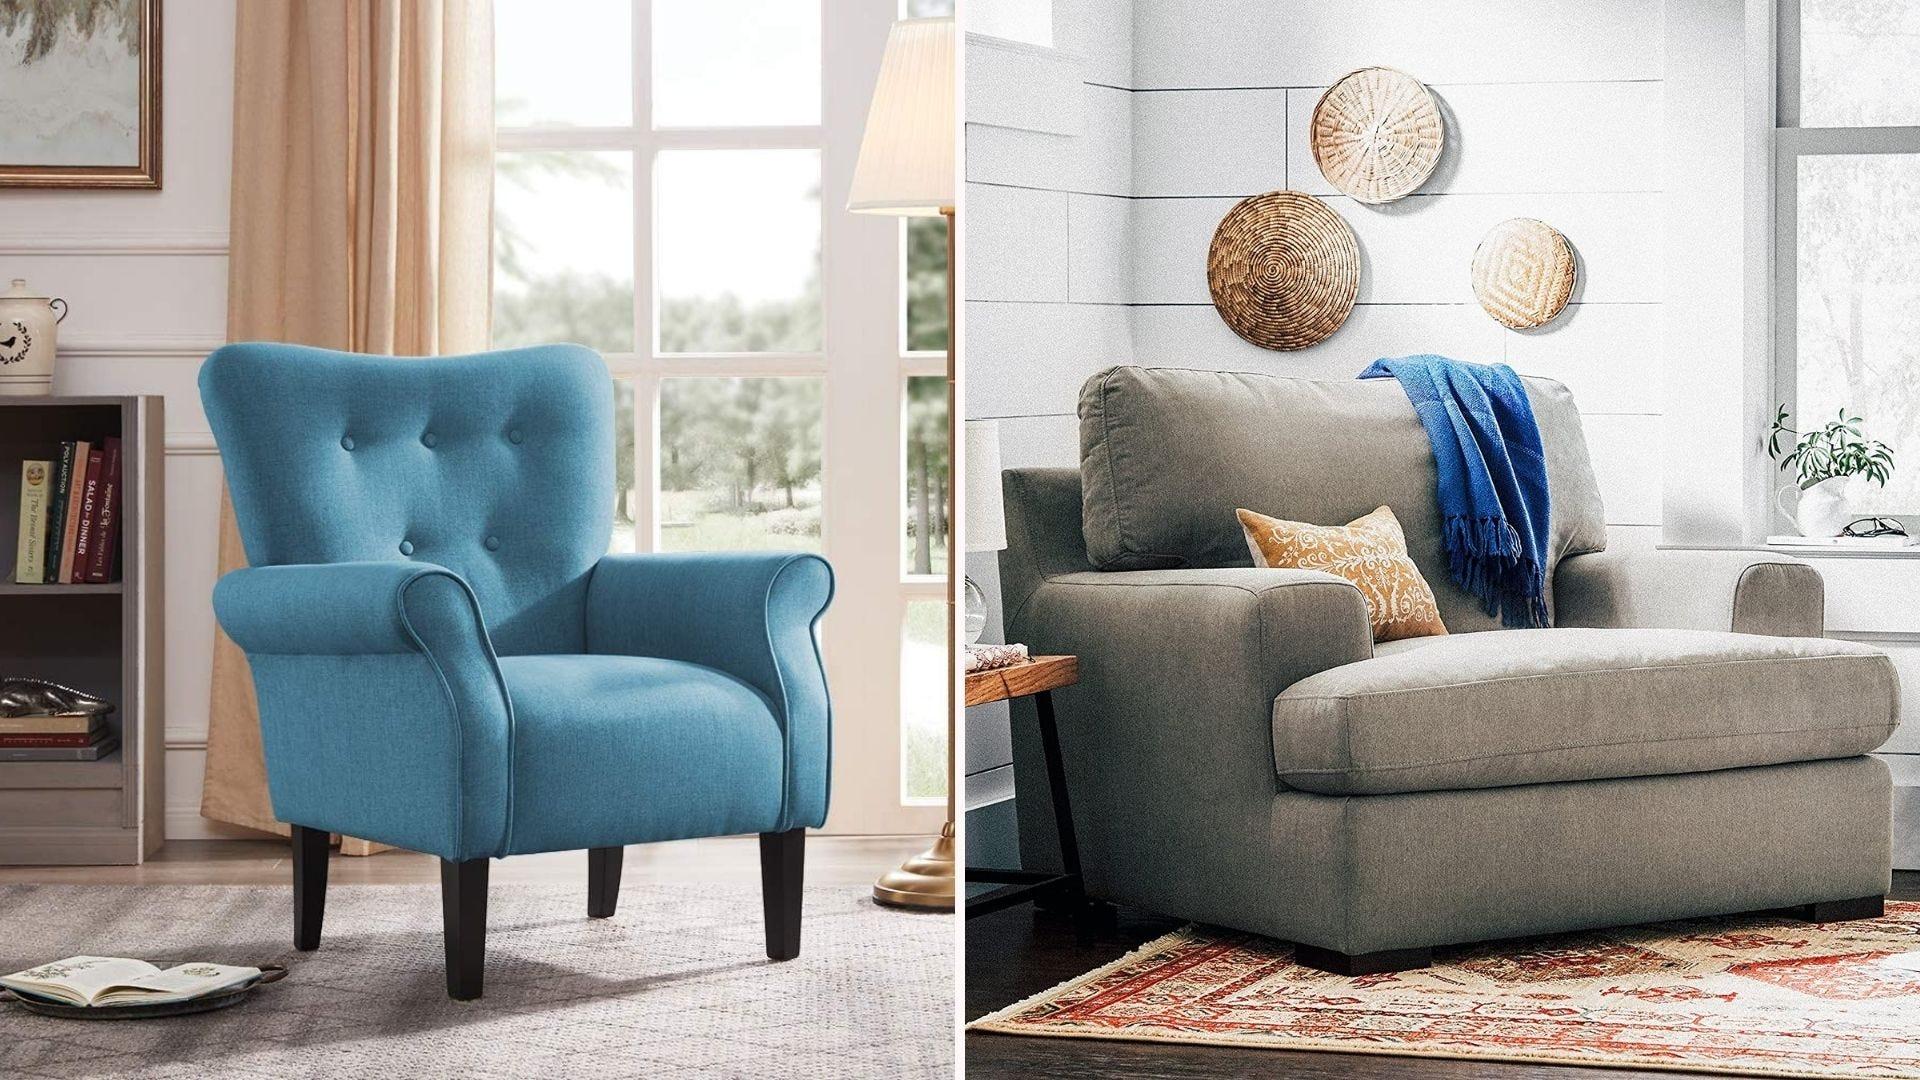 A blue accent chair; an oversized gray chair